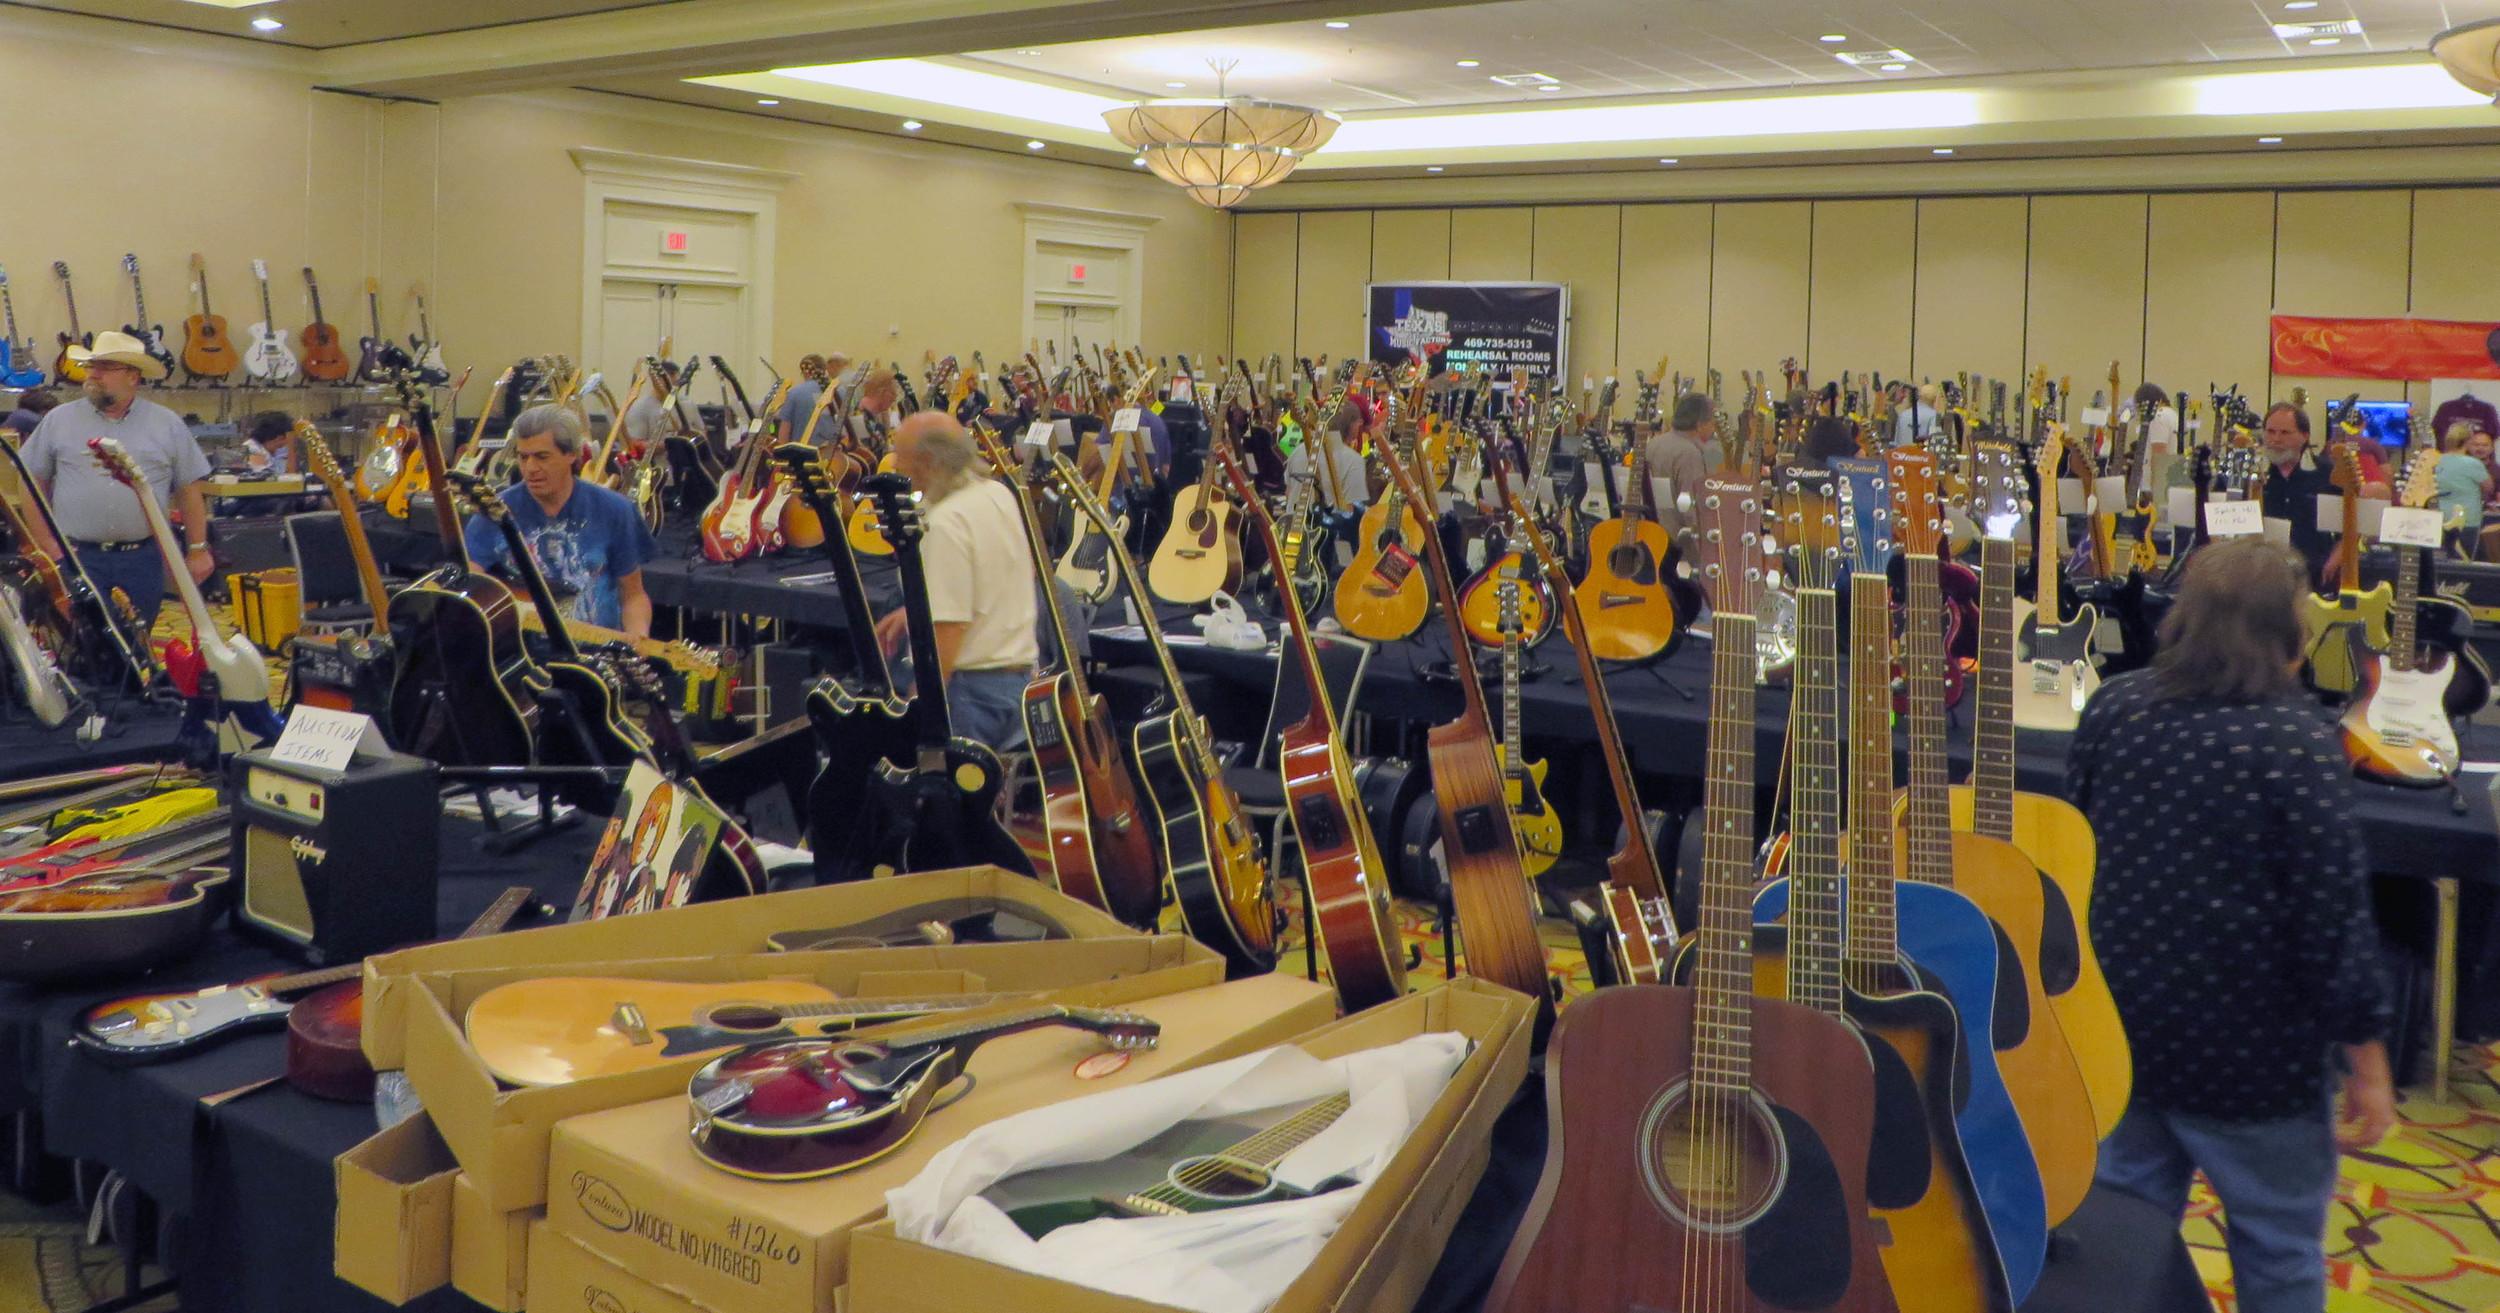 Guitars, guitars, and more guitars... and a mandolin.